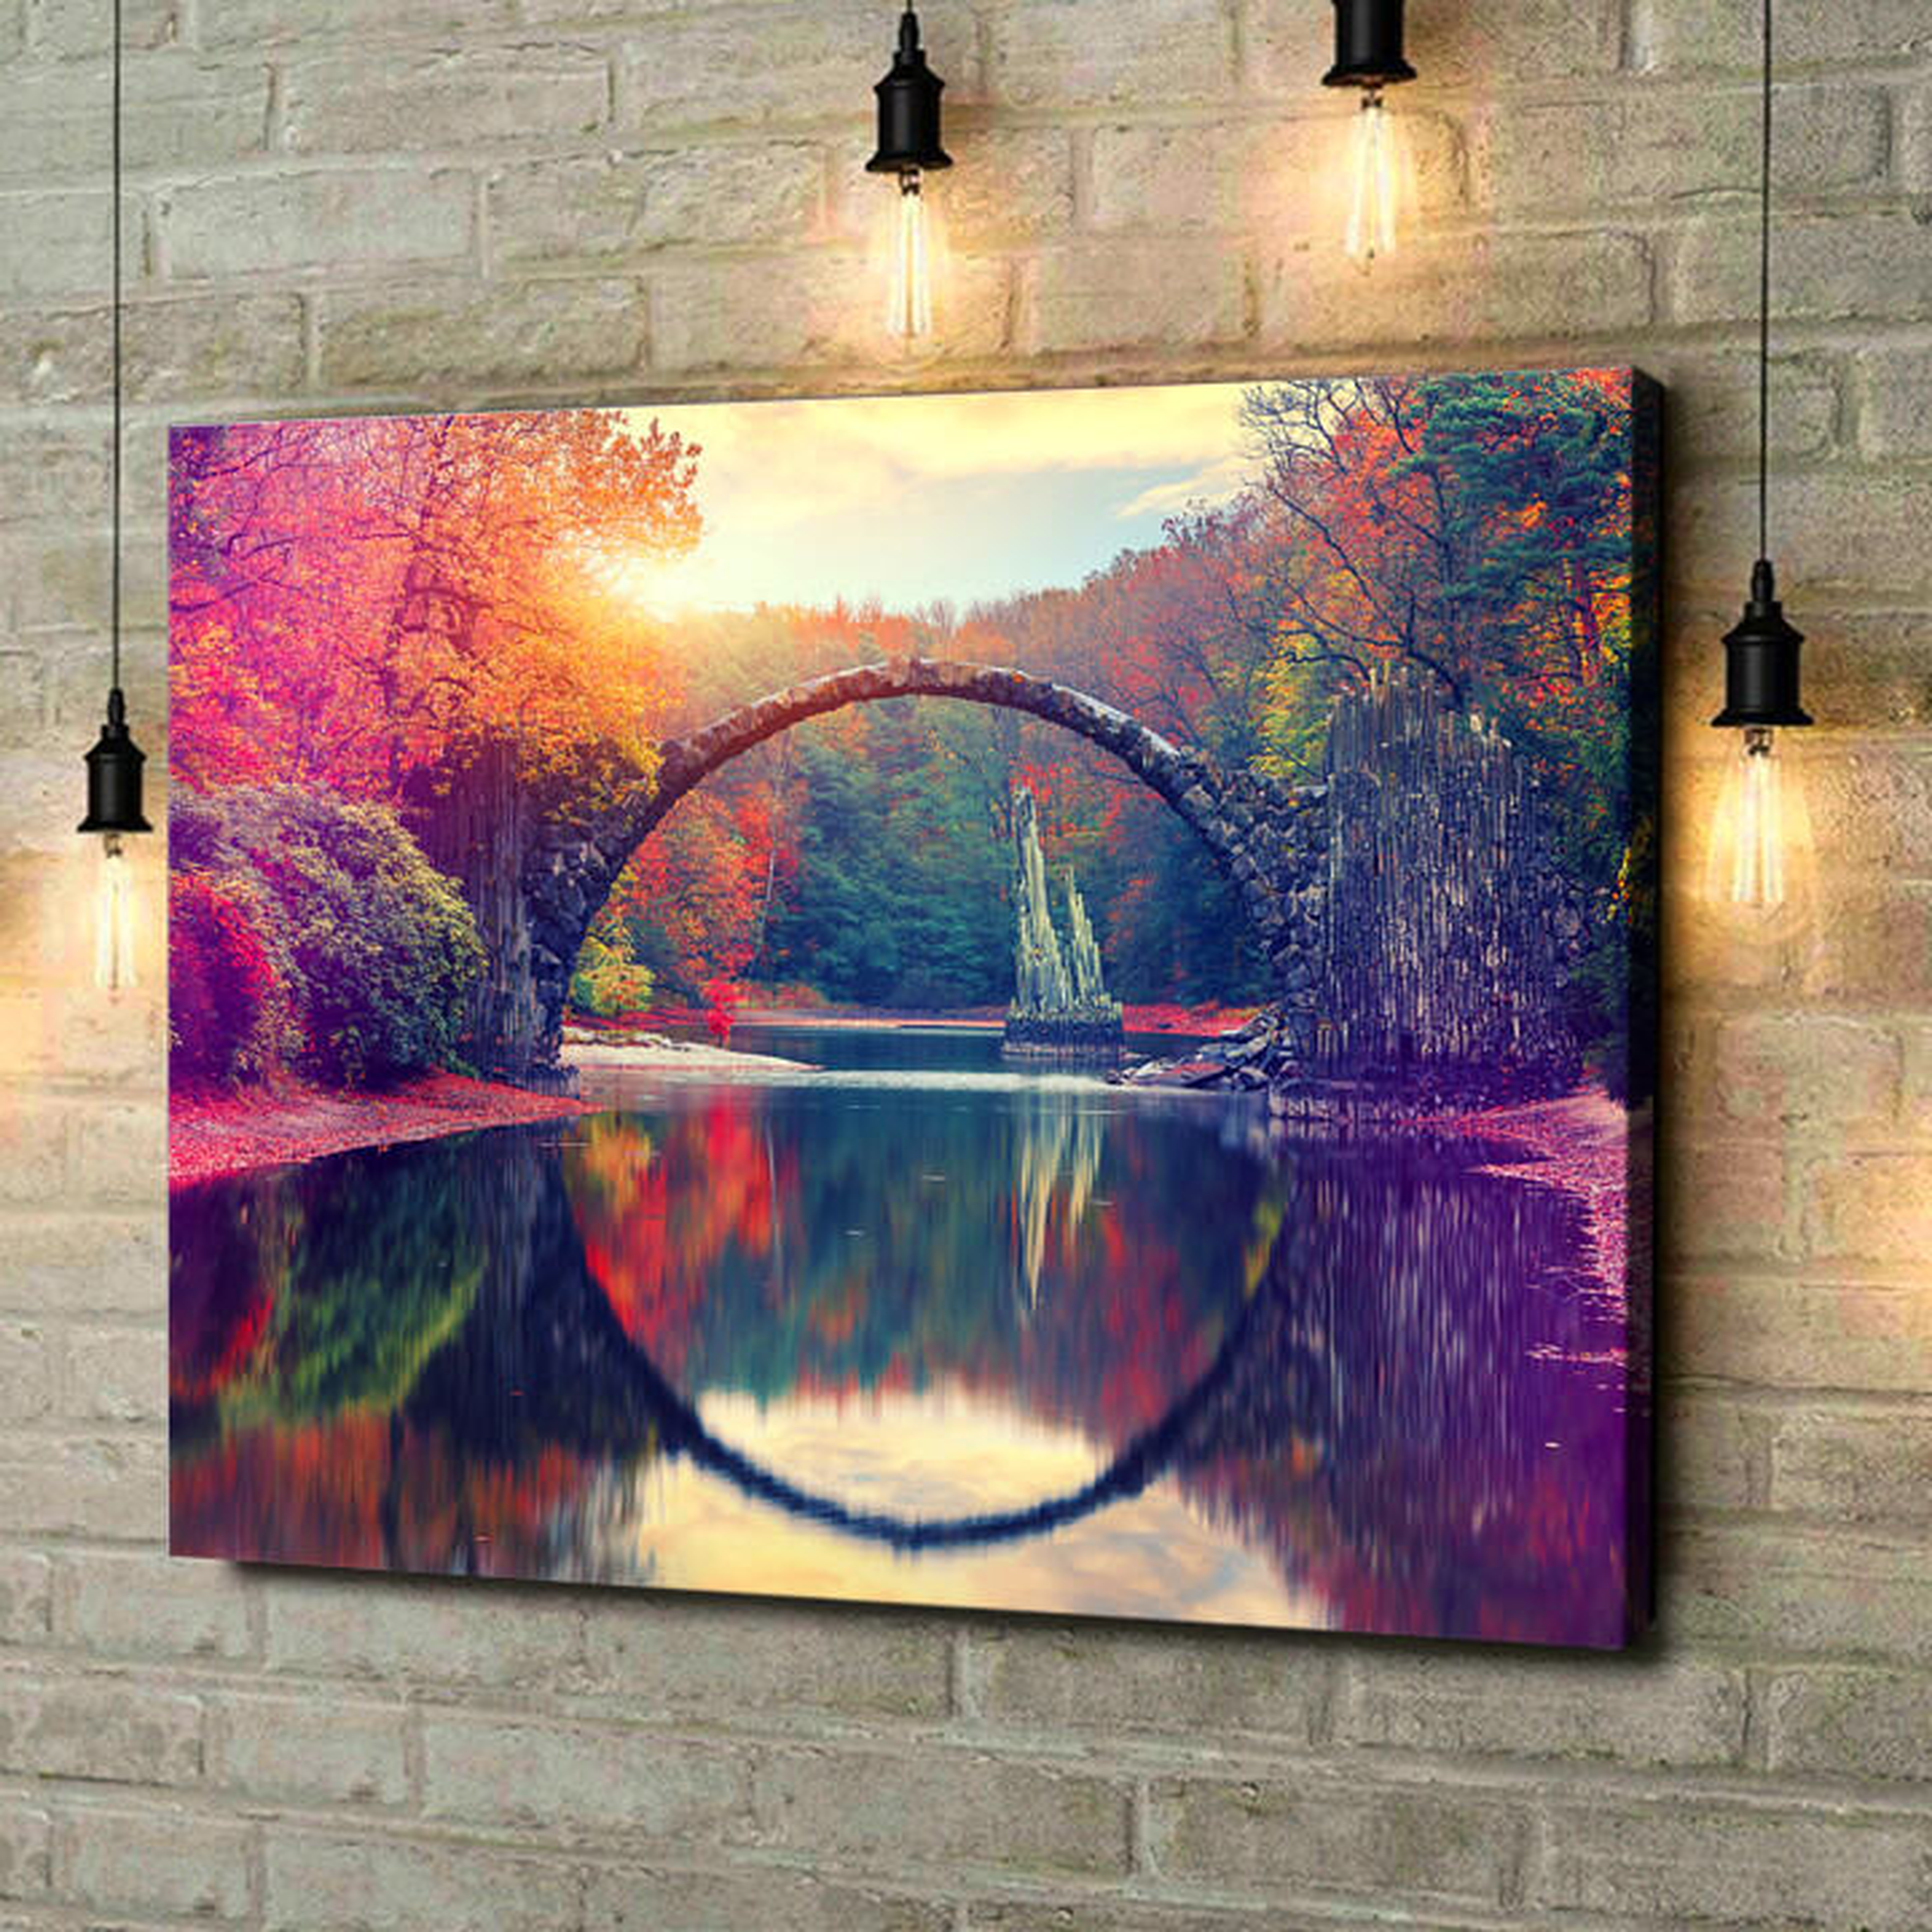 Leinwandbild personalisiert Rakotz Brücke Azalea und Rhododendron Park Kromlau